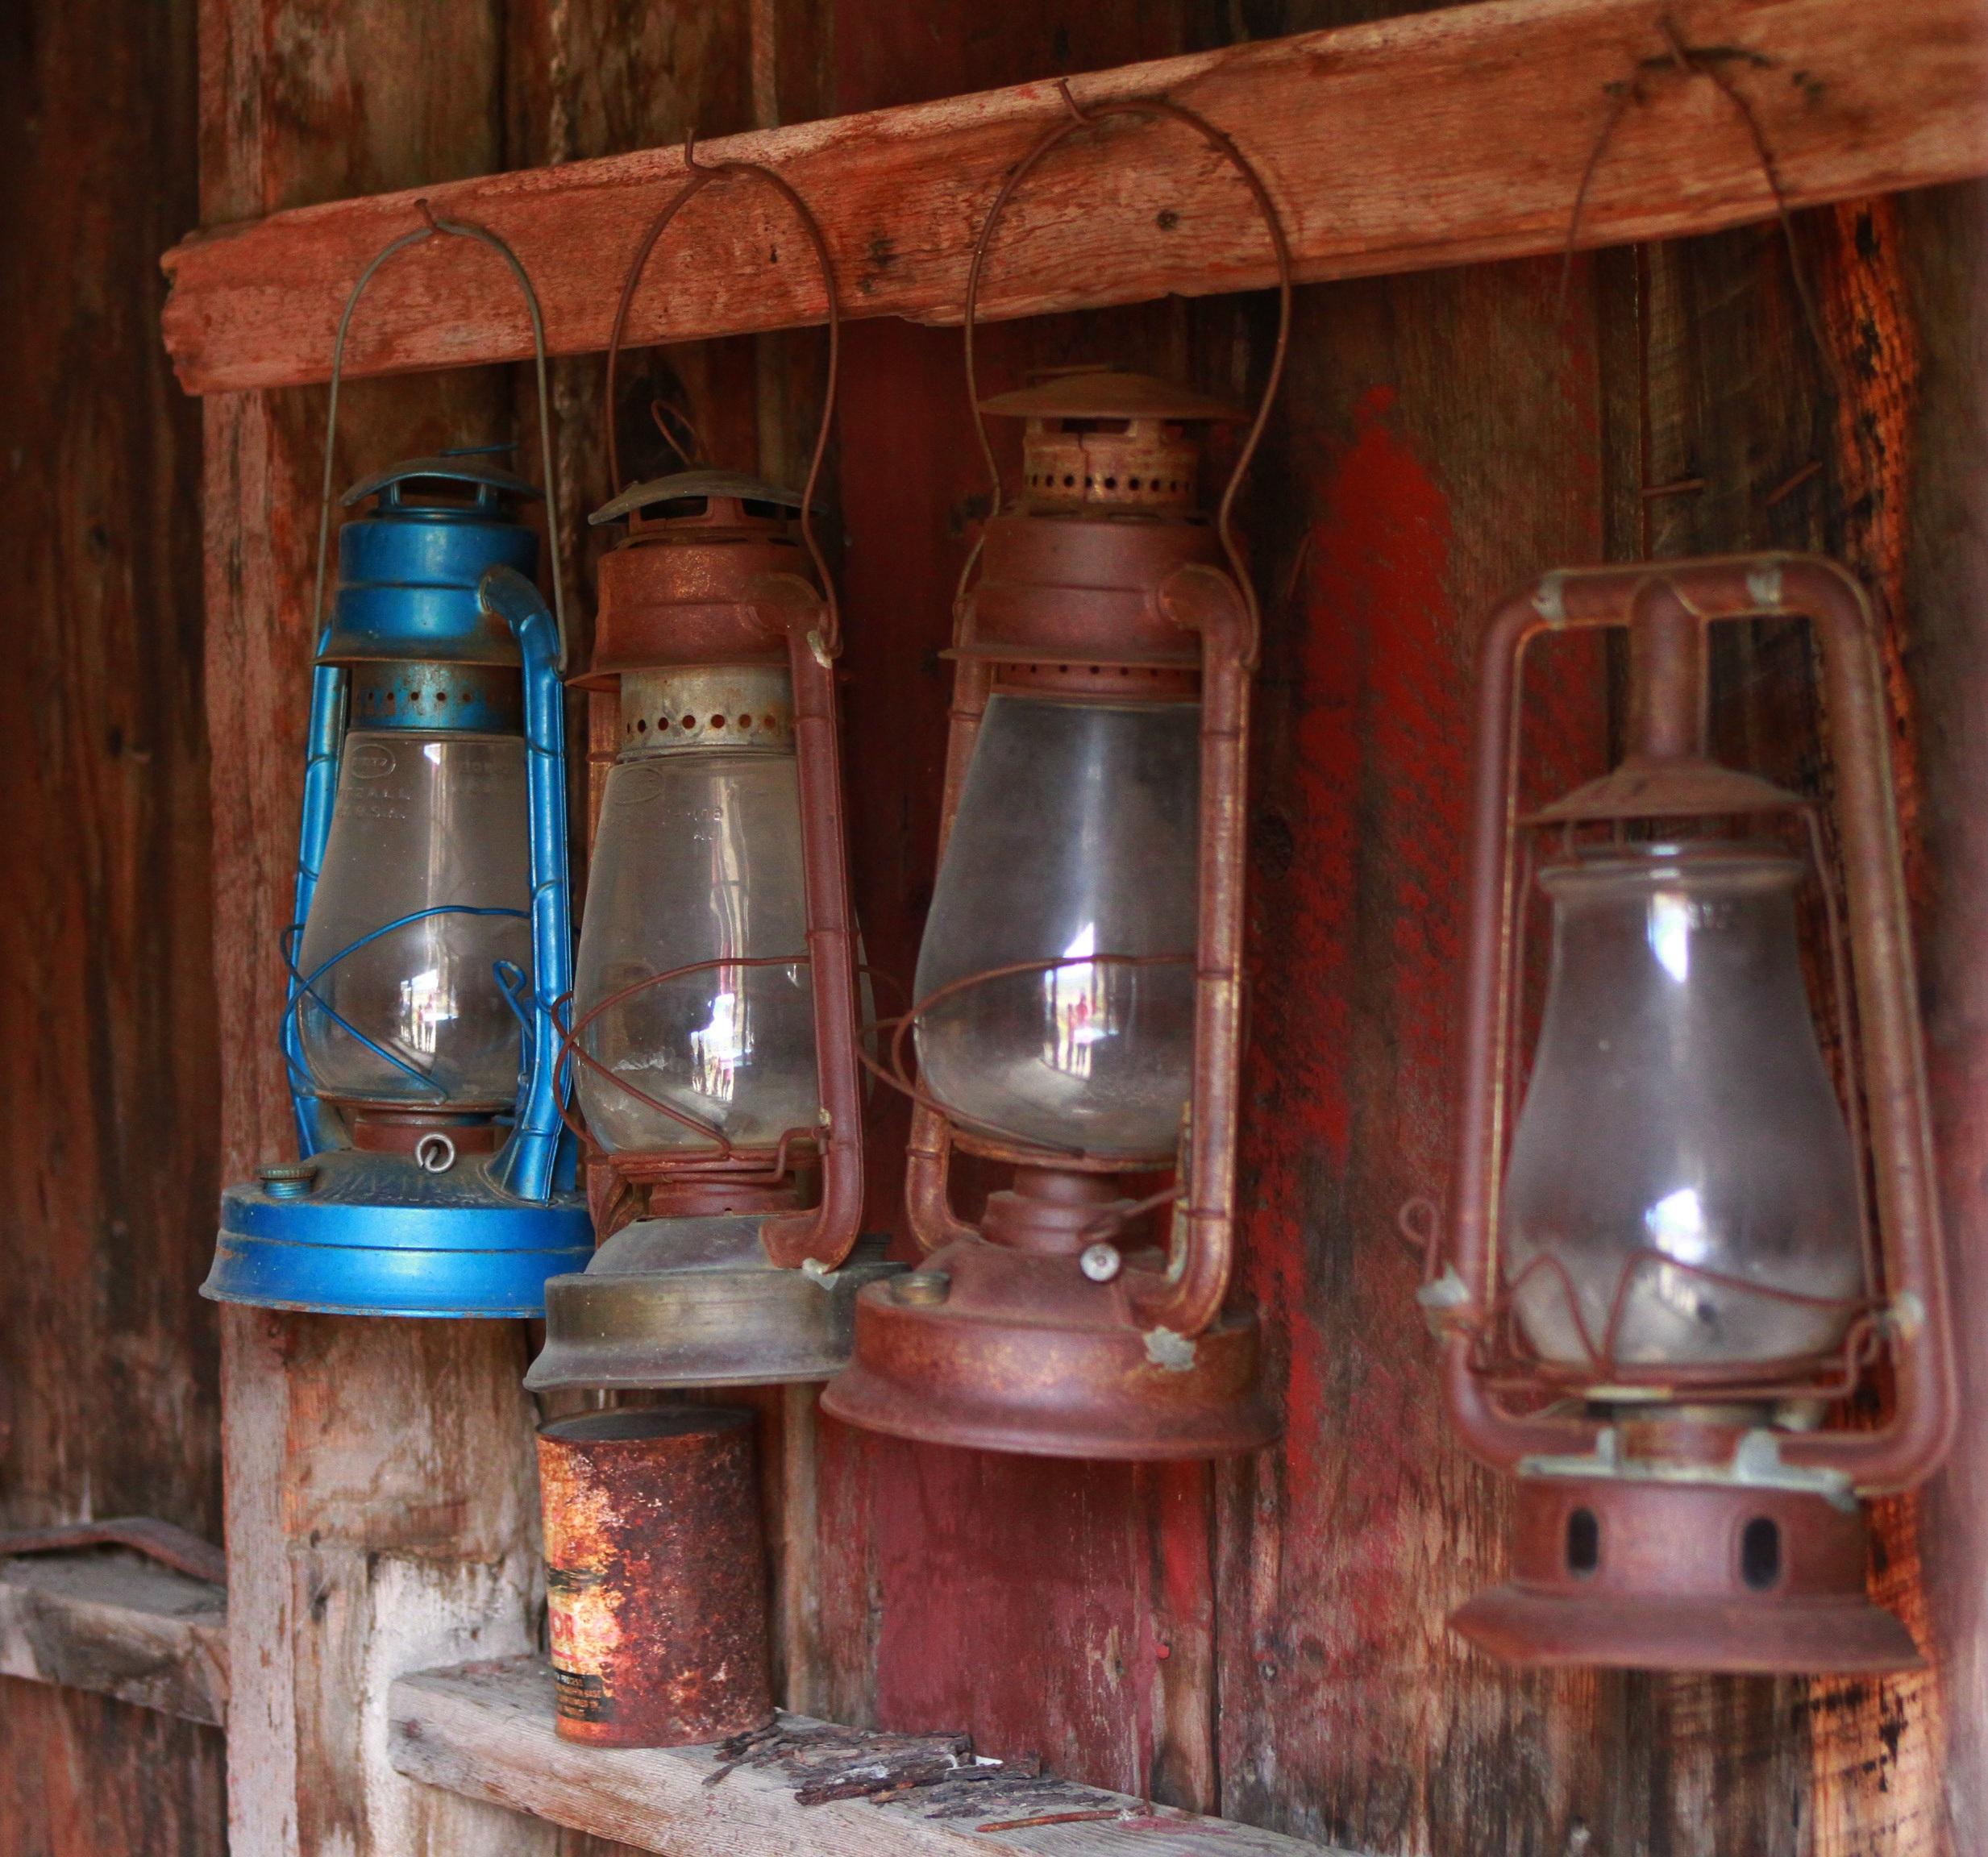 Fotos gratis : ligero, madera, vendimia, antiguo, Retro, vaso, pared ...